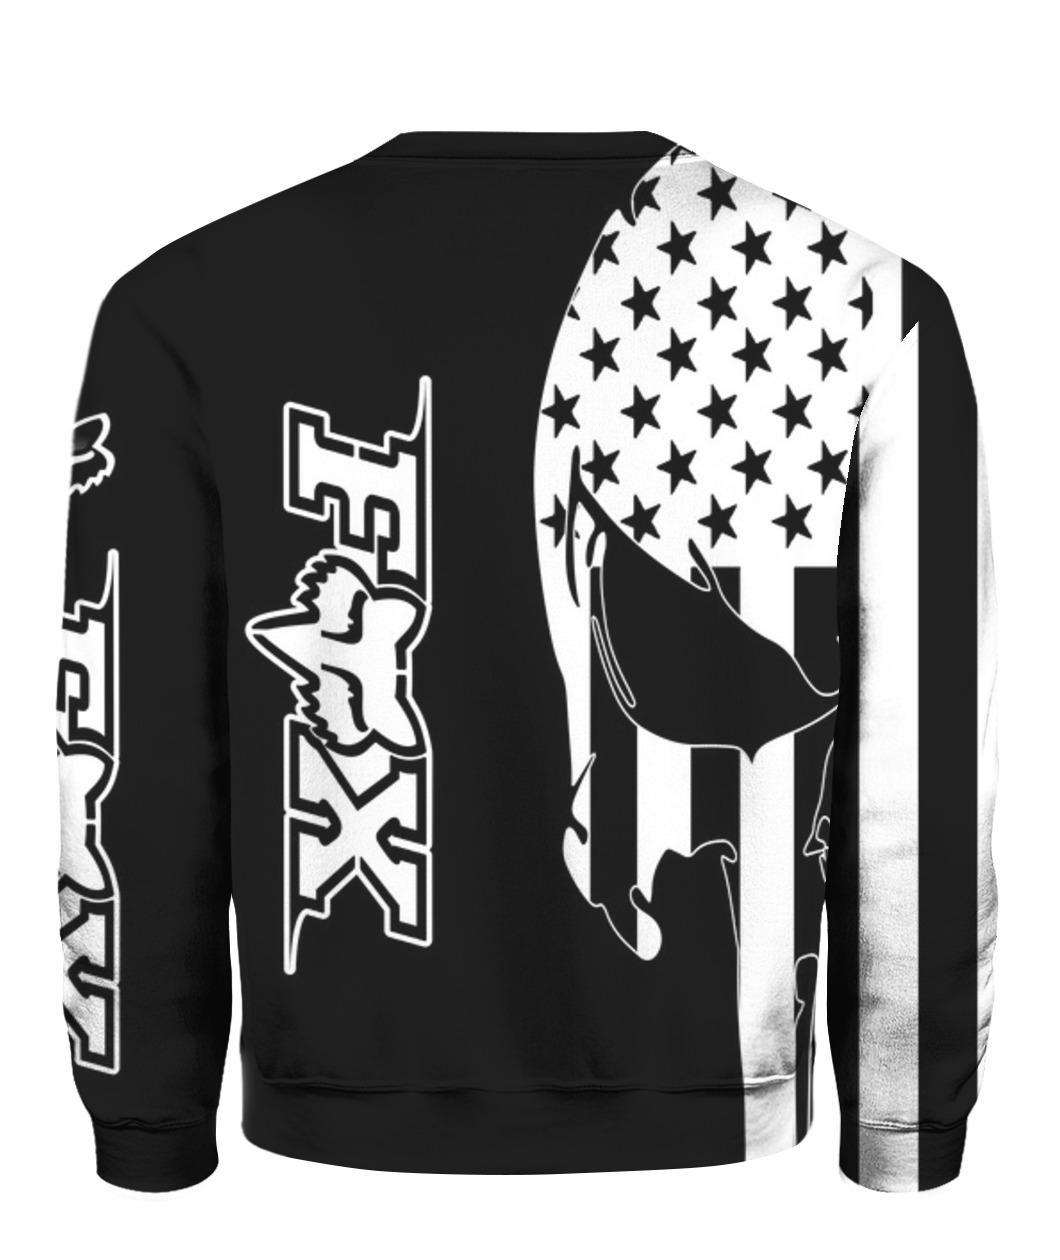 American flag skull fox racing full printing sweatshirt - back